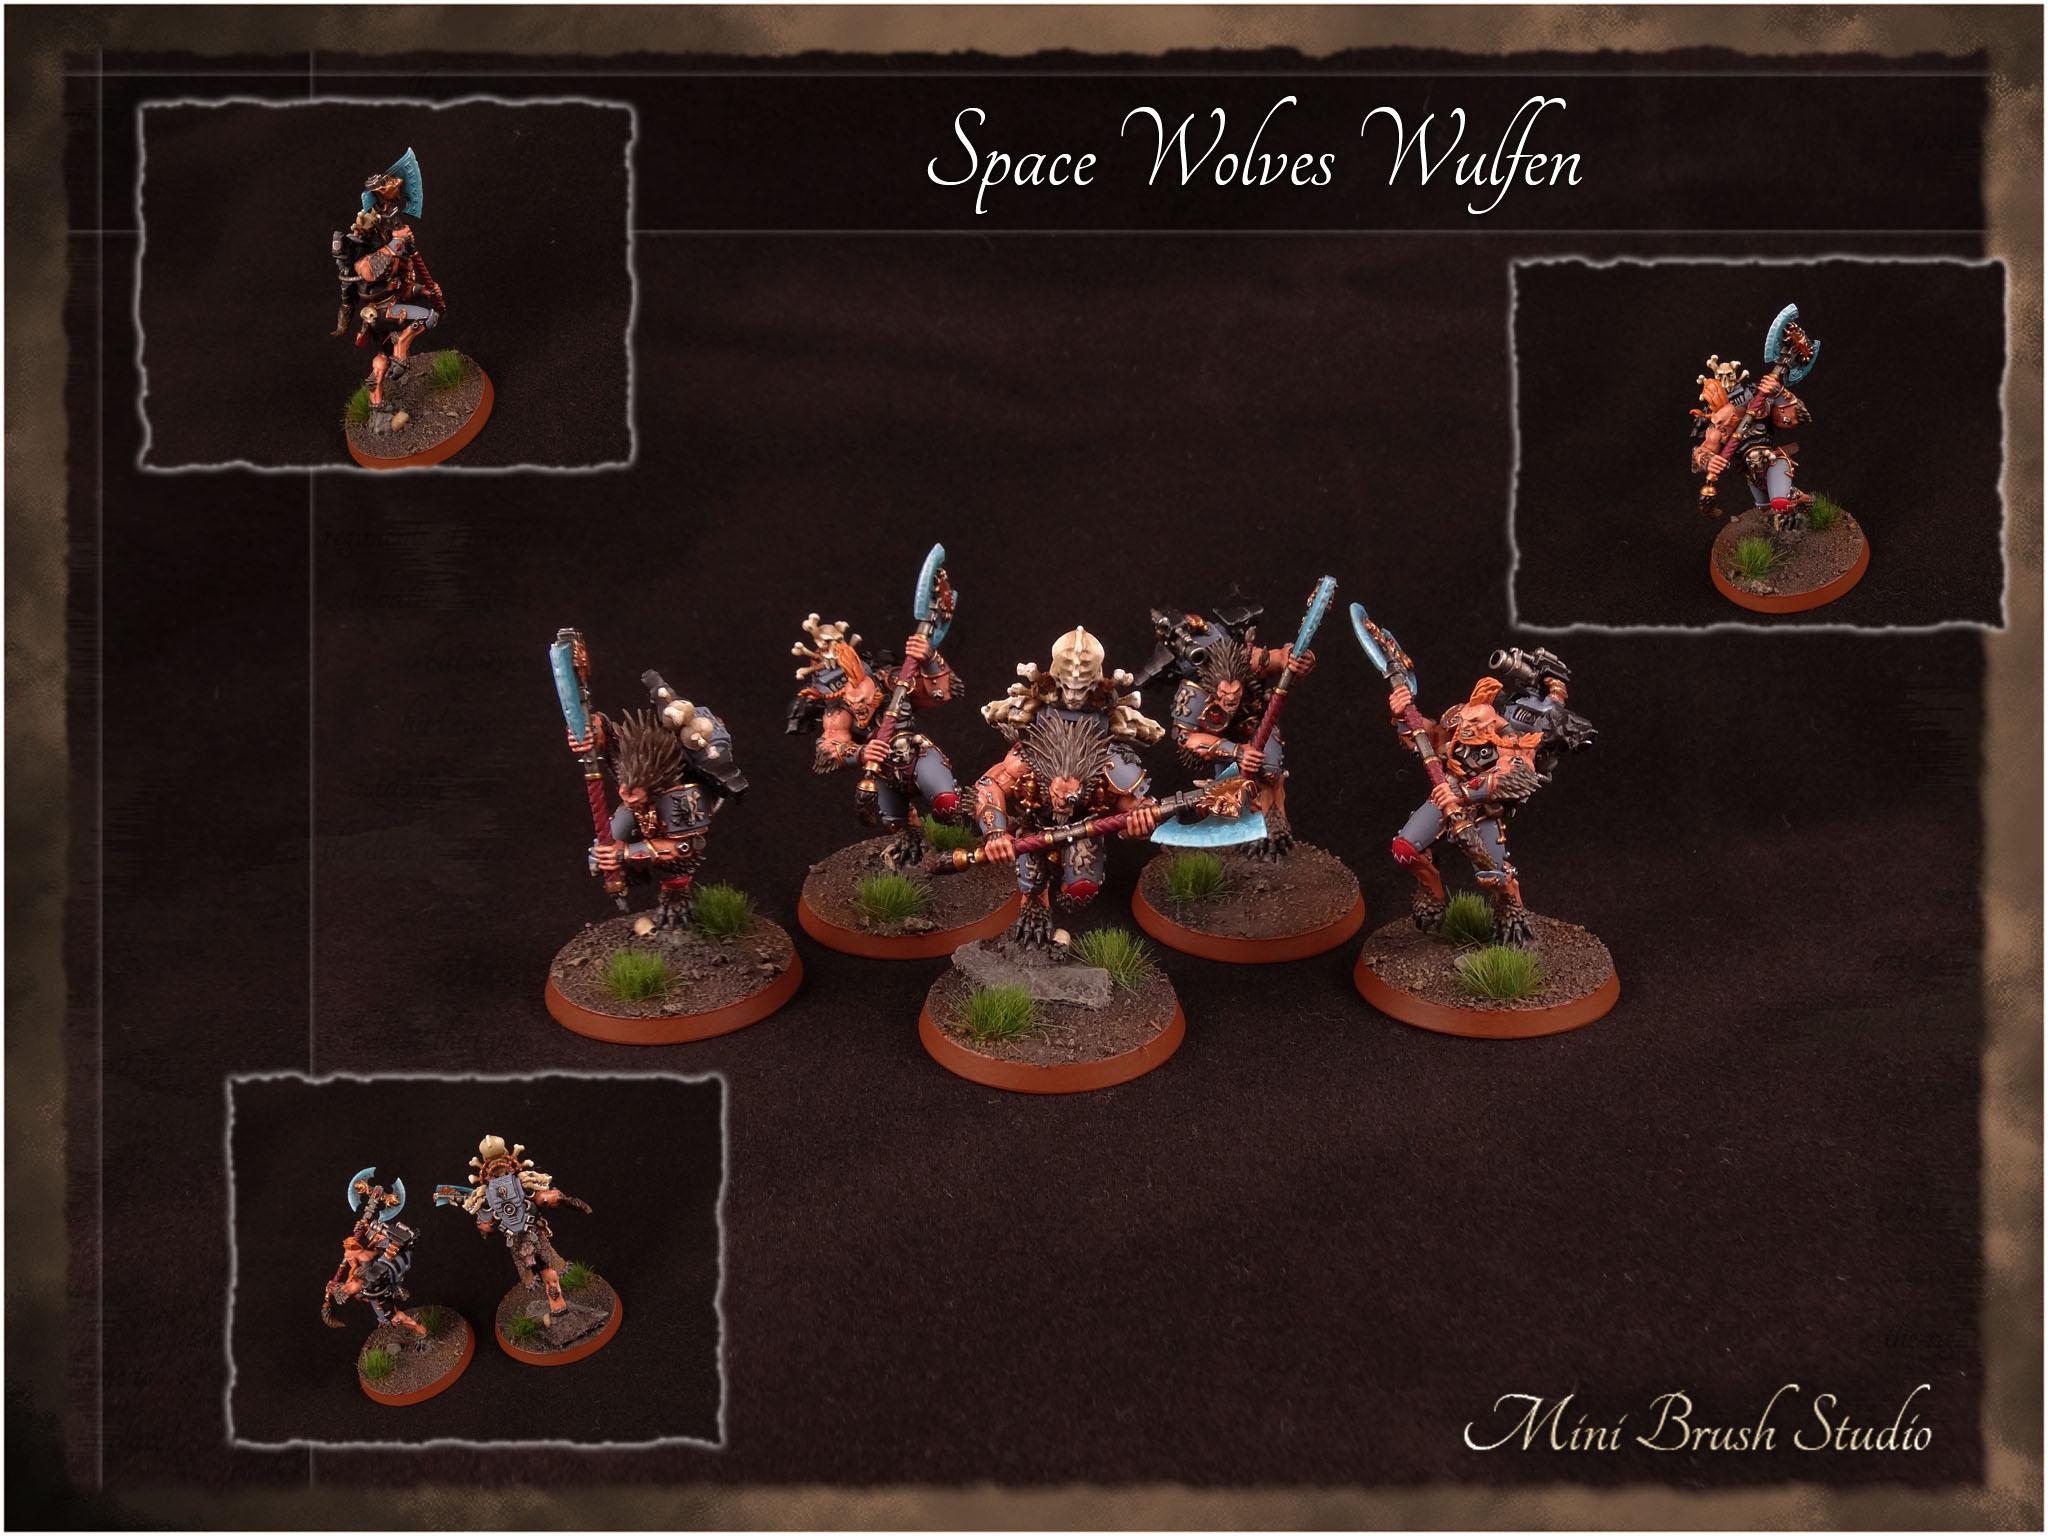 Space Wolves Wulfen 2 v7.jpg